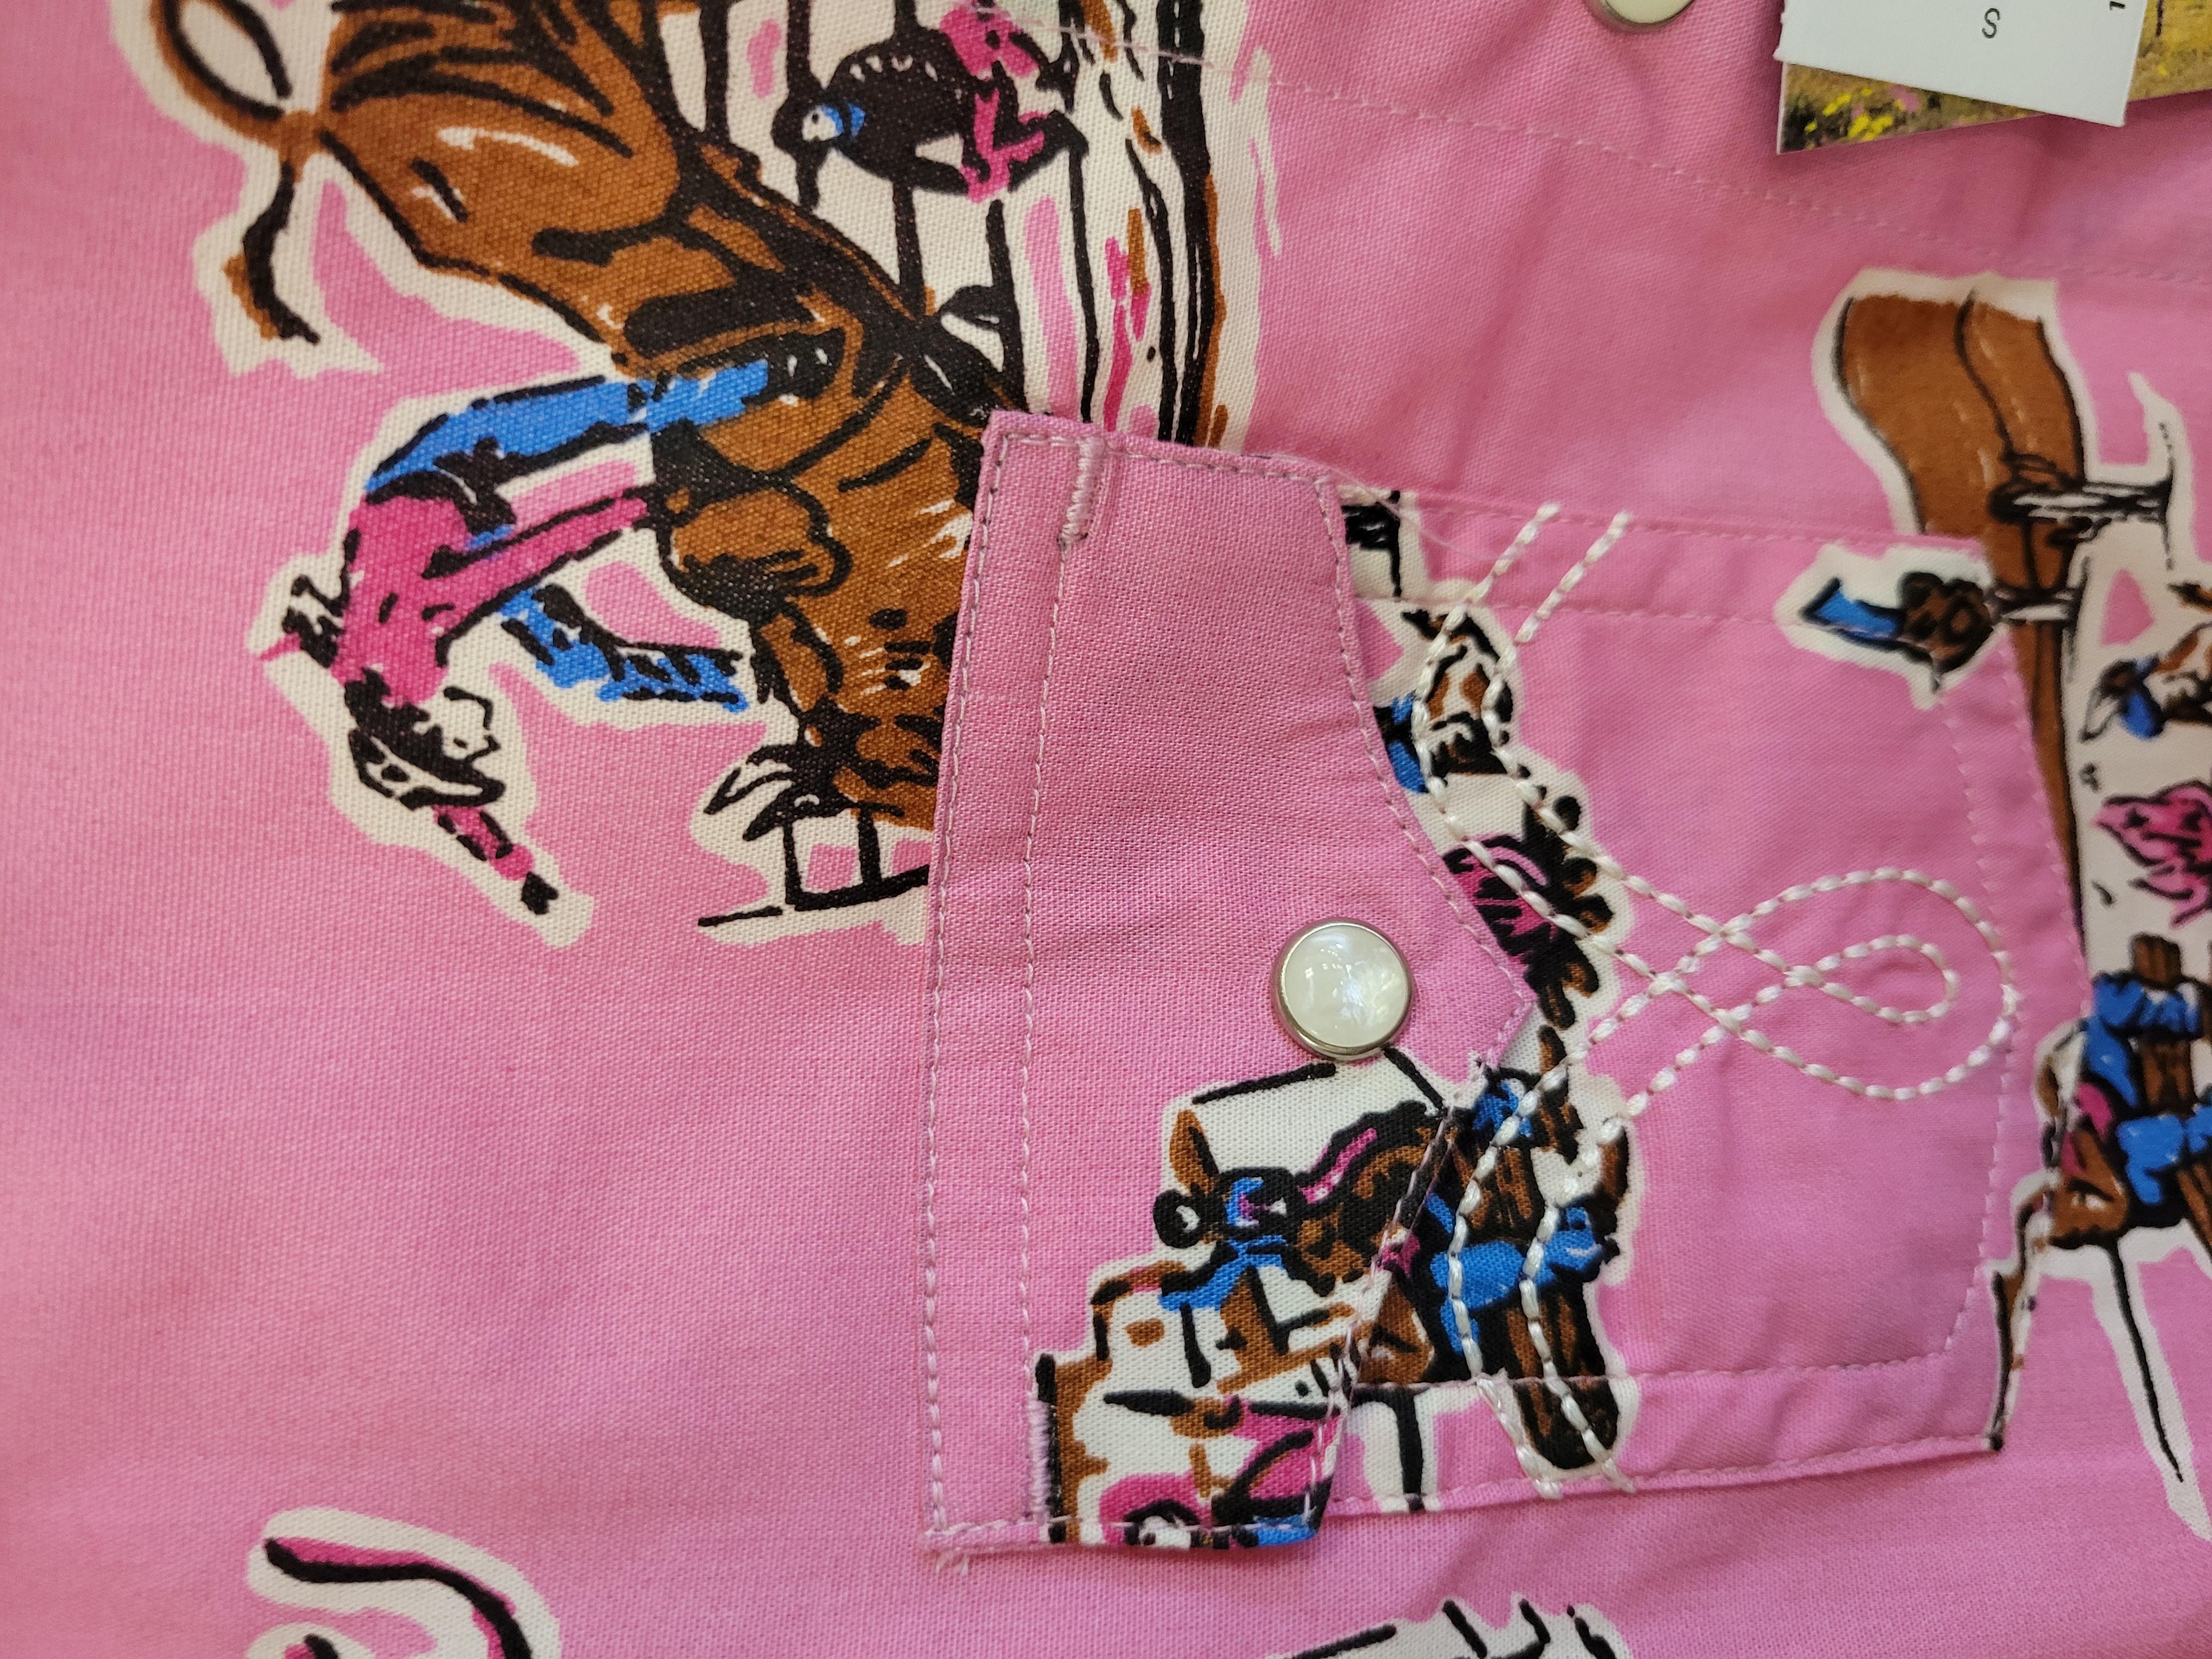 panhandle-girls-ls-blouse-details.jpg